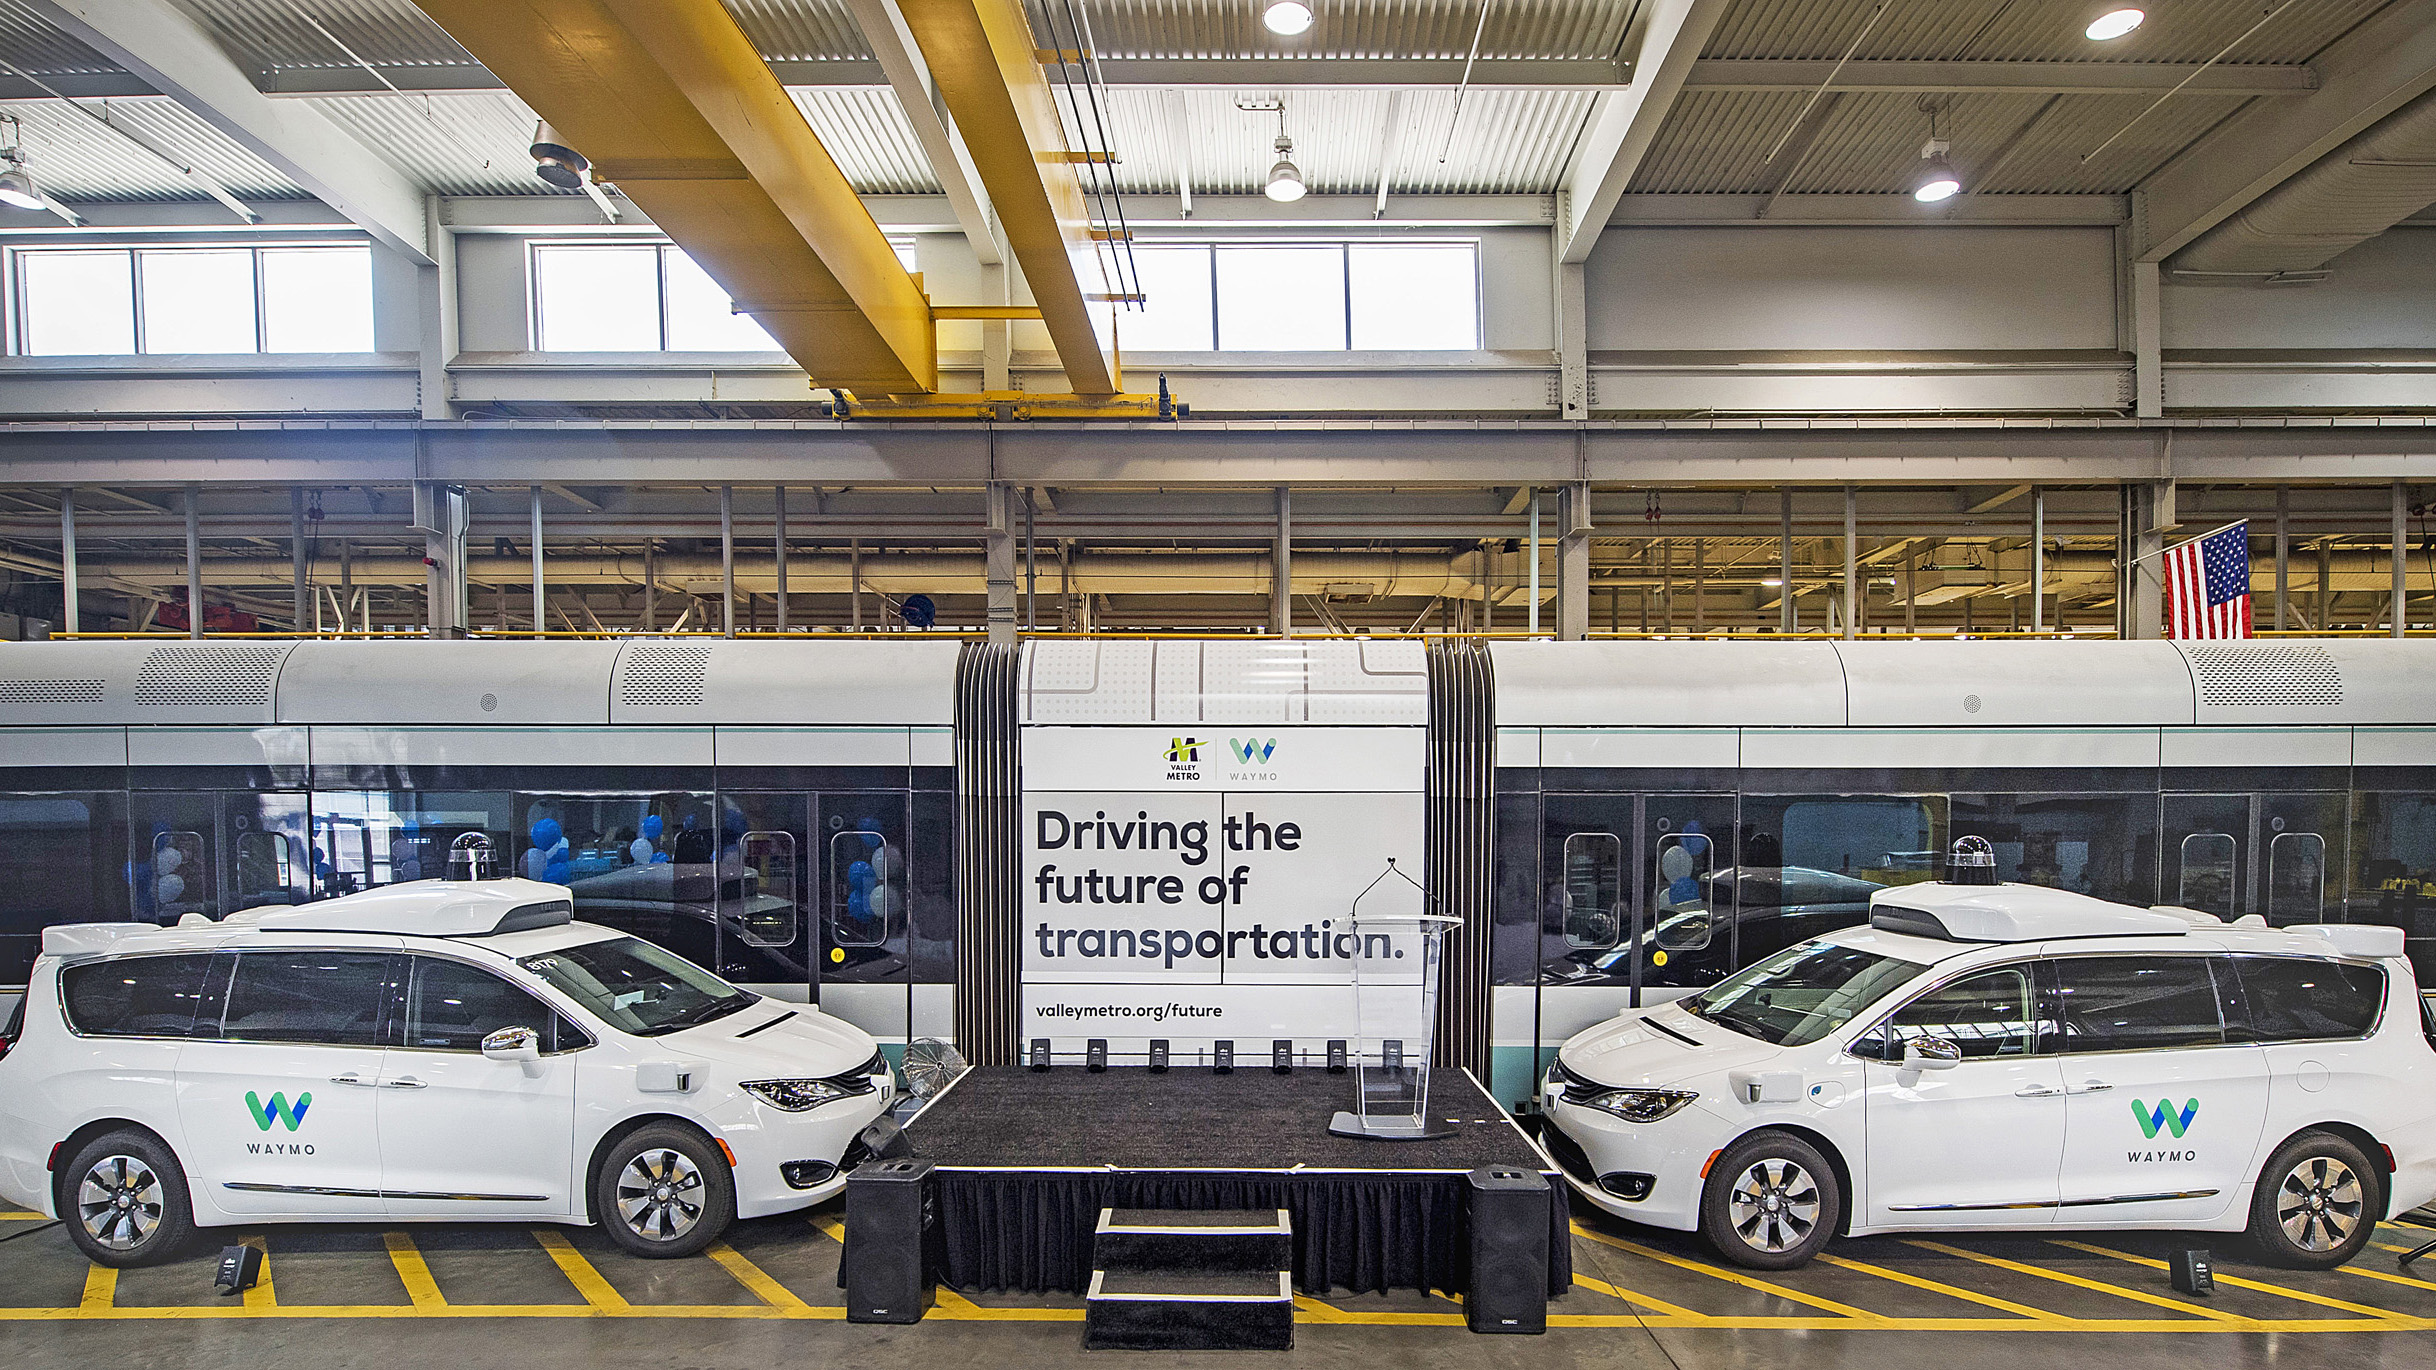 Pair of Waymo autonomous vehicles next to a stage